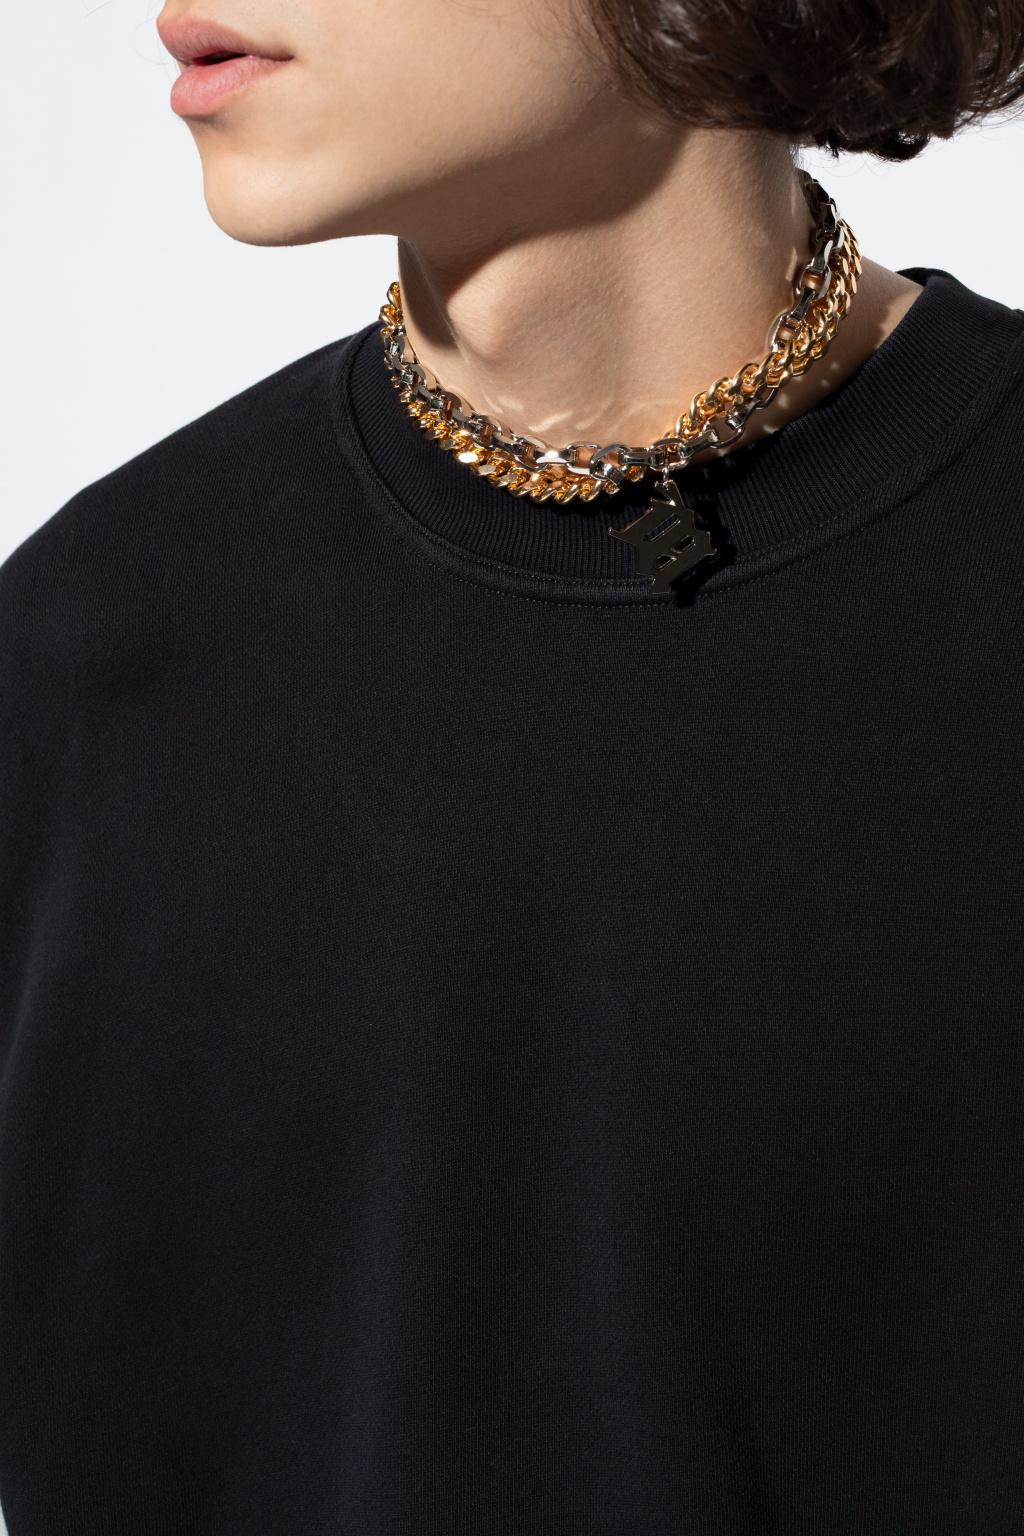 MISBHV 'M' monogram necklace